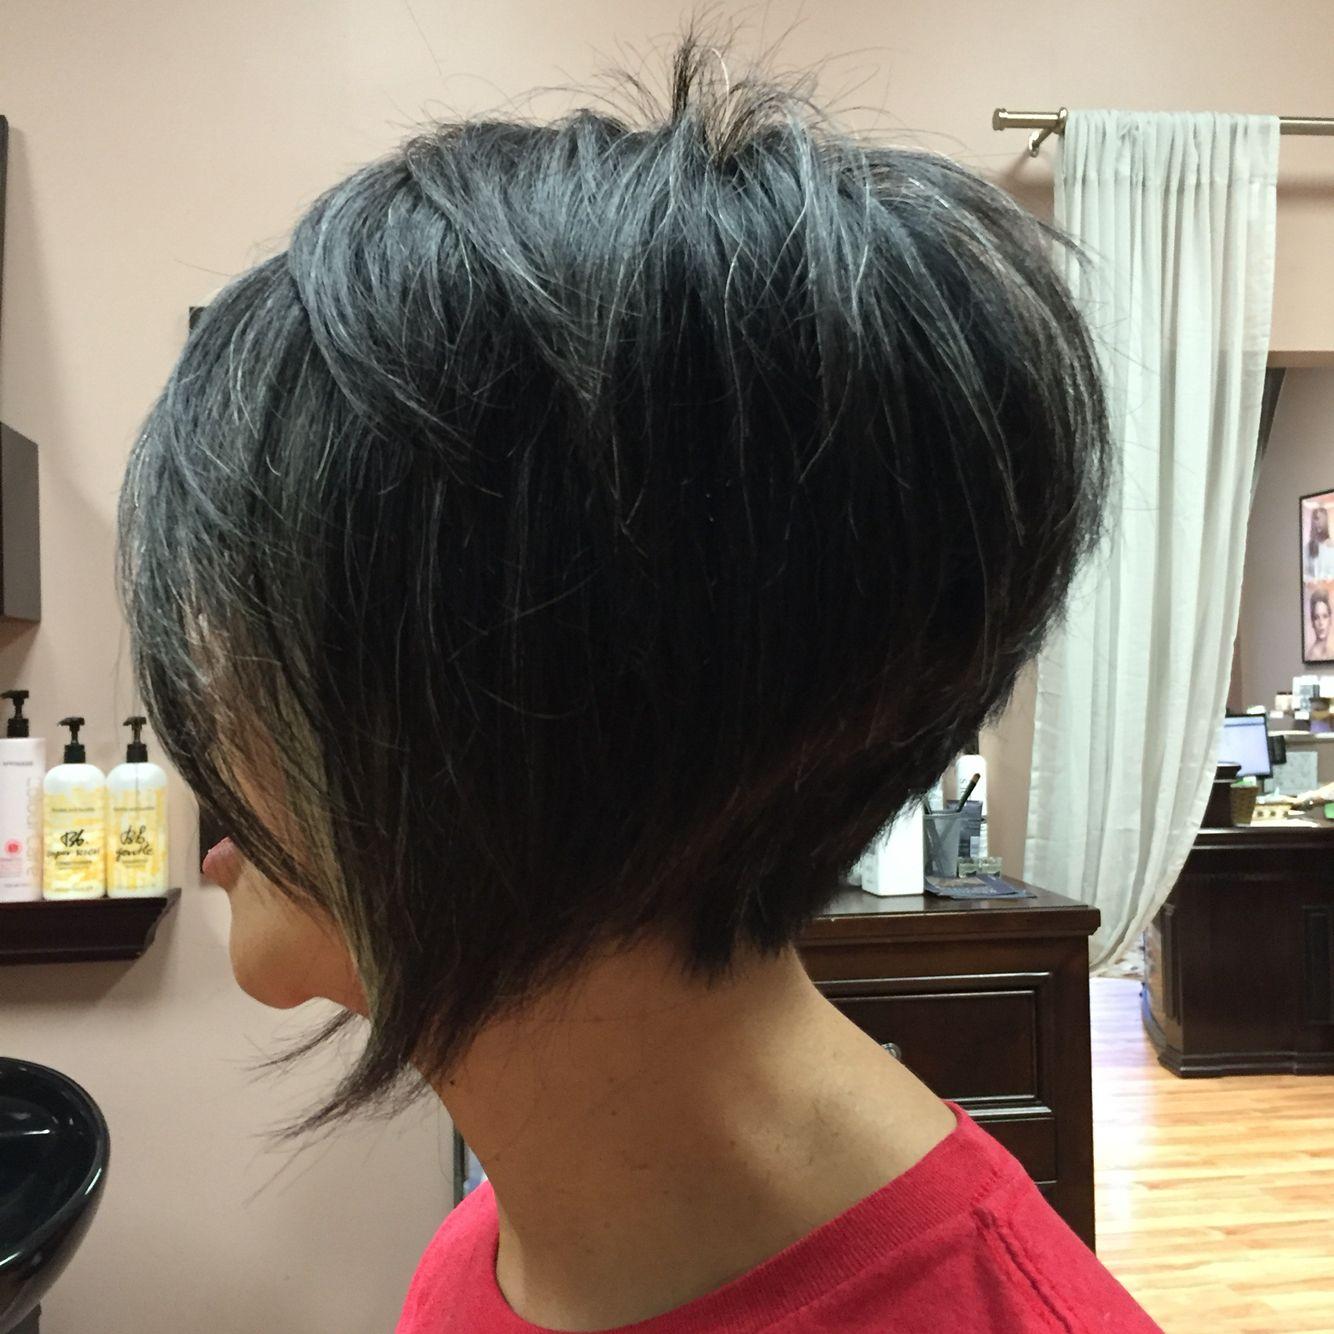 Posh Haircut Done By Kimmy At Modern Tekniques In Shrewsbury Kort Haar Kapsels Kapsels Korte Kapsels